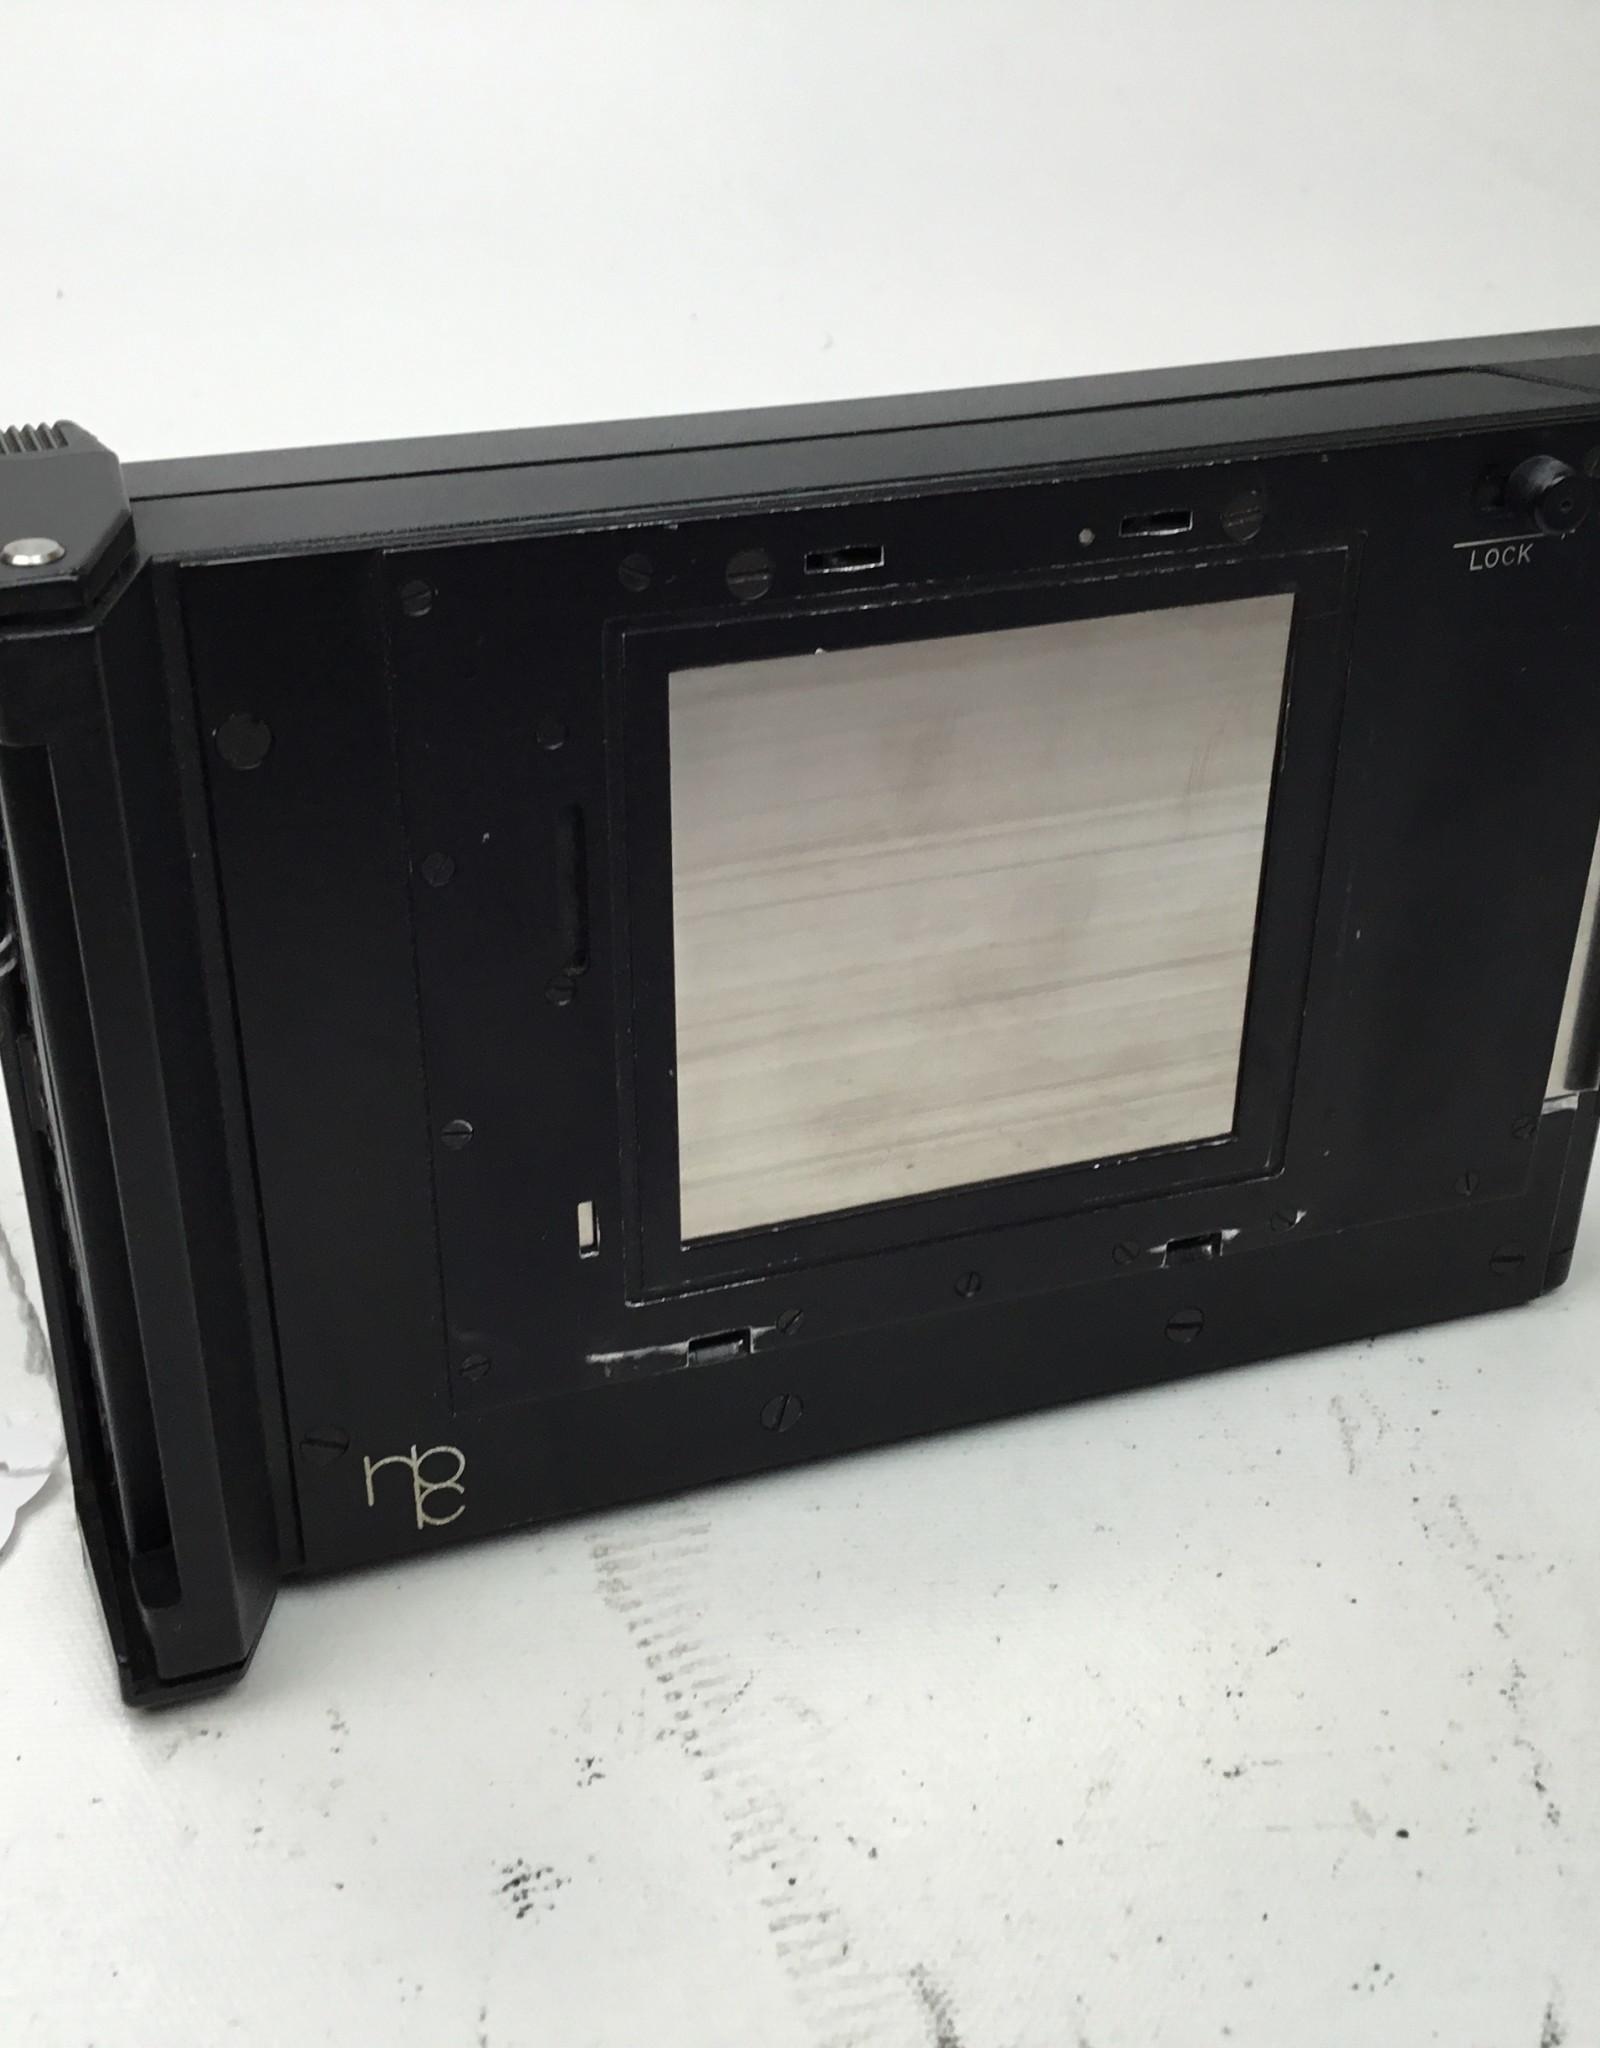 NPC Polaroid Back for Hasselblad Used Fair